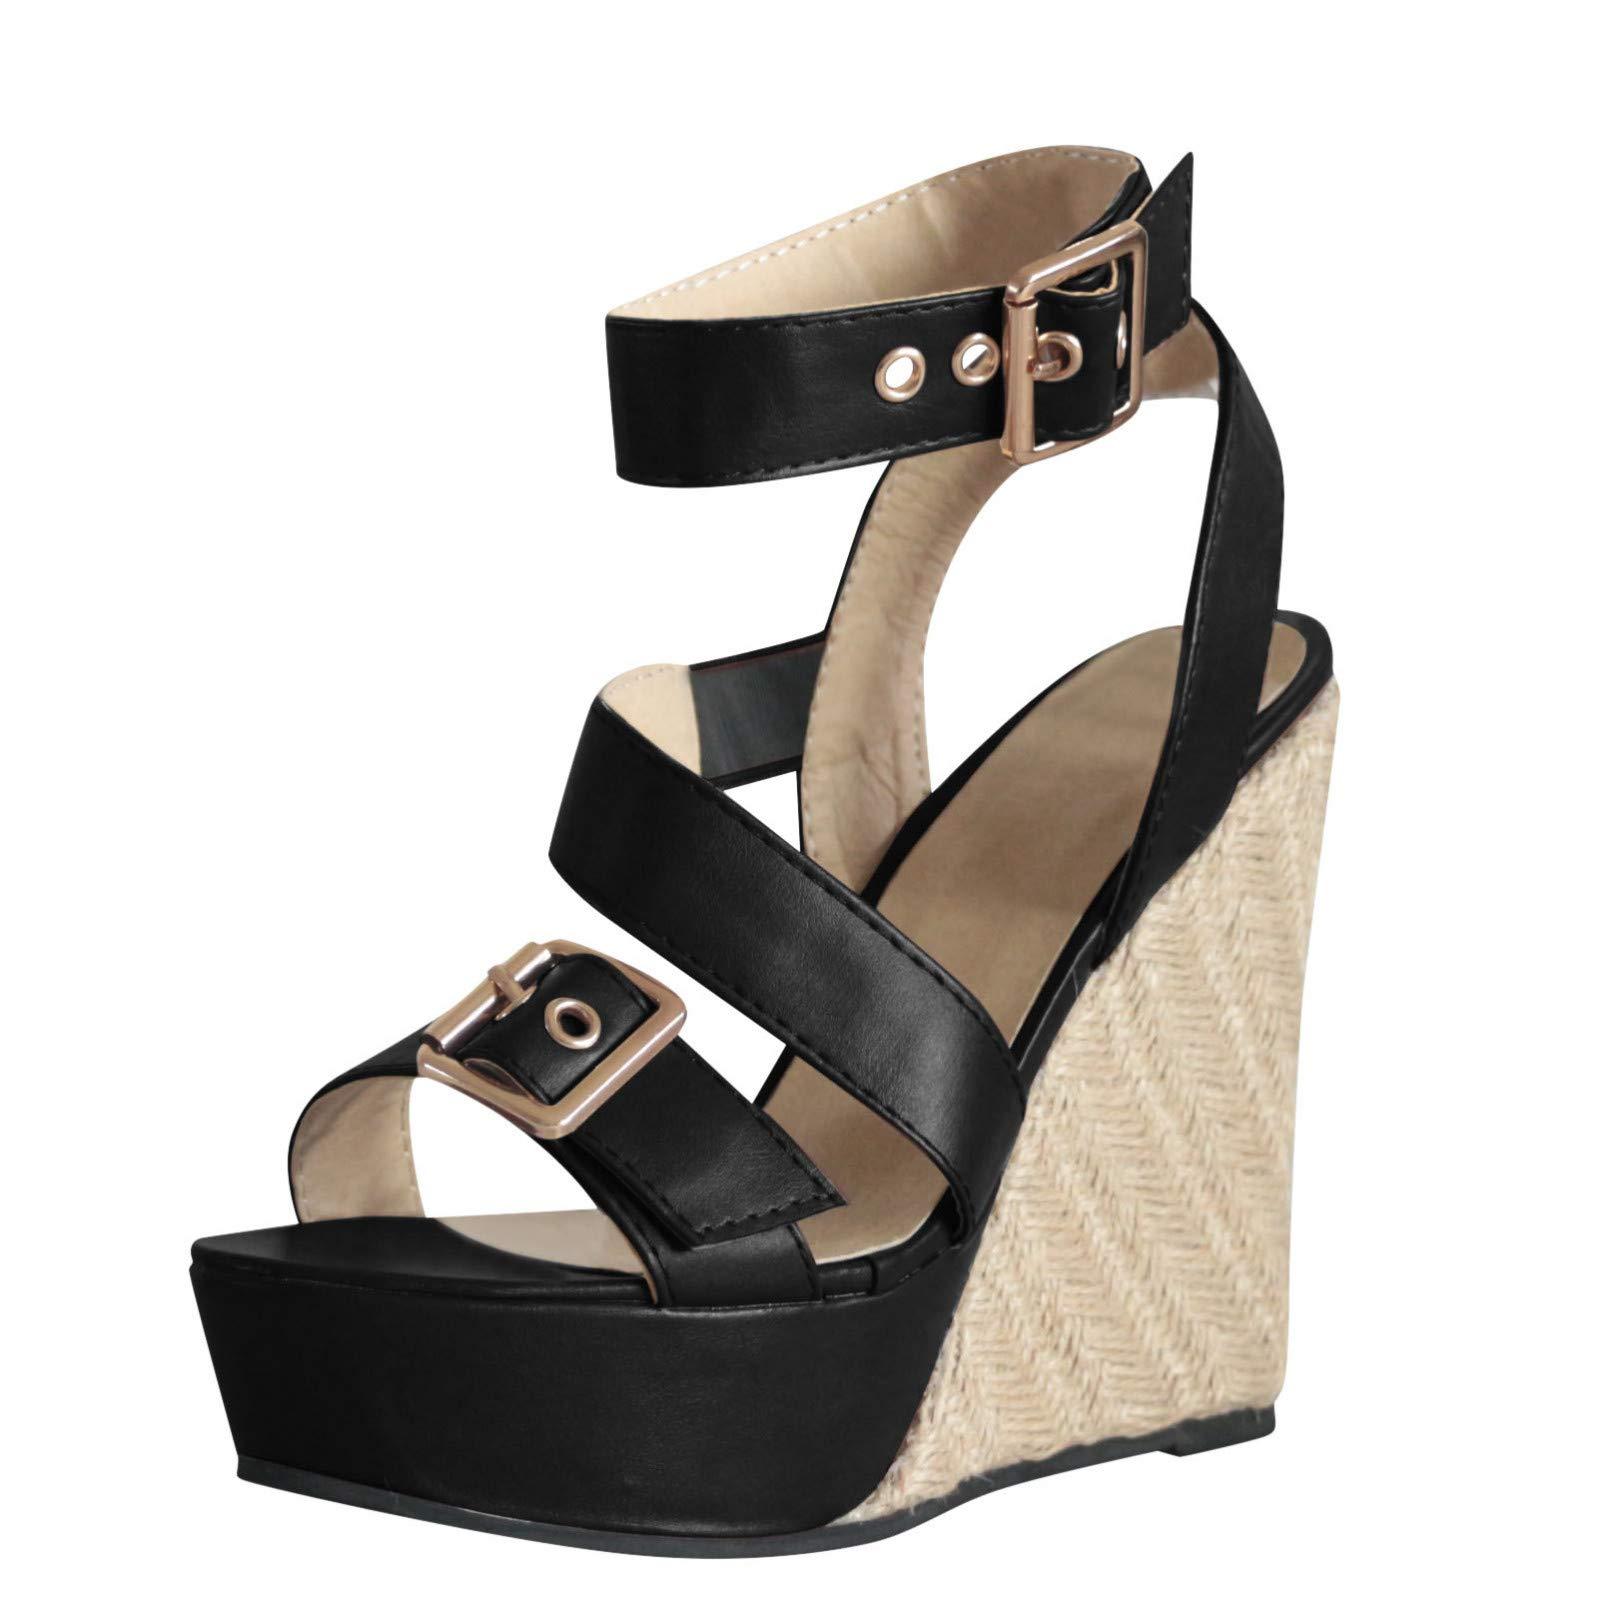 Women's Wedge Sandals Summer Buckle Strap Open Toe Platform High Heels Ankle Strap Pumps Shoes (Black -6, US:7.0)